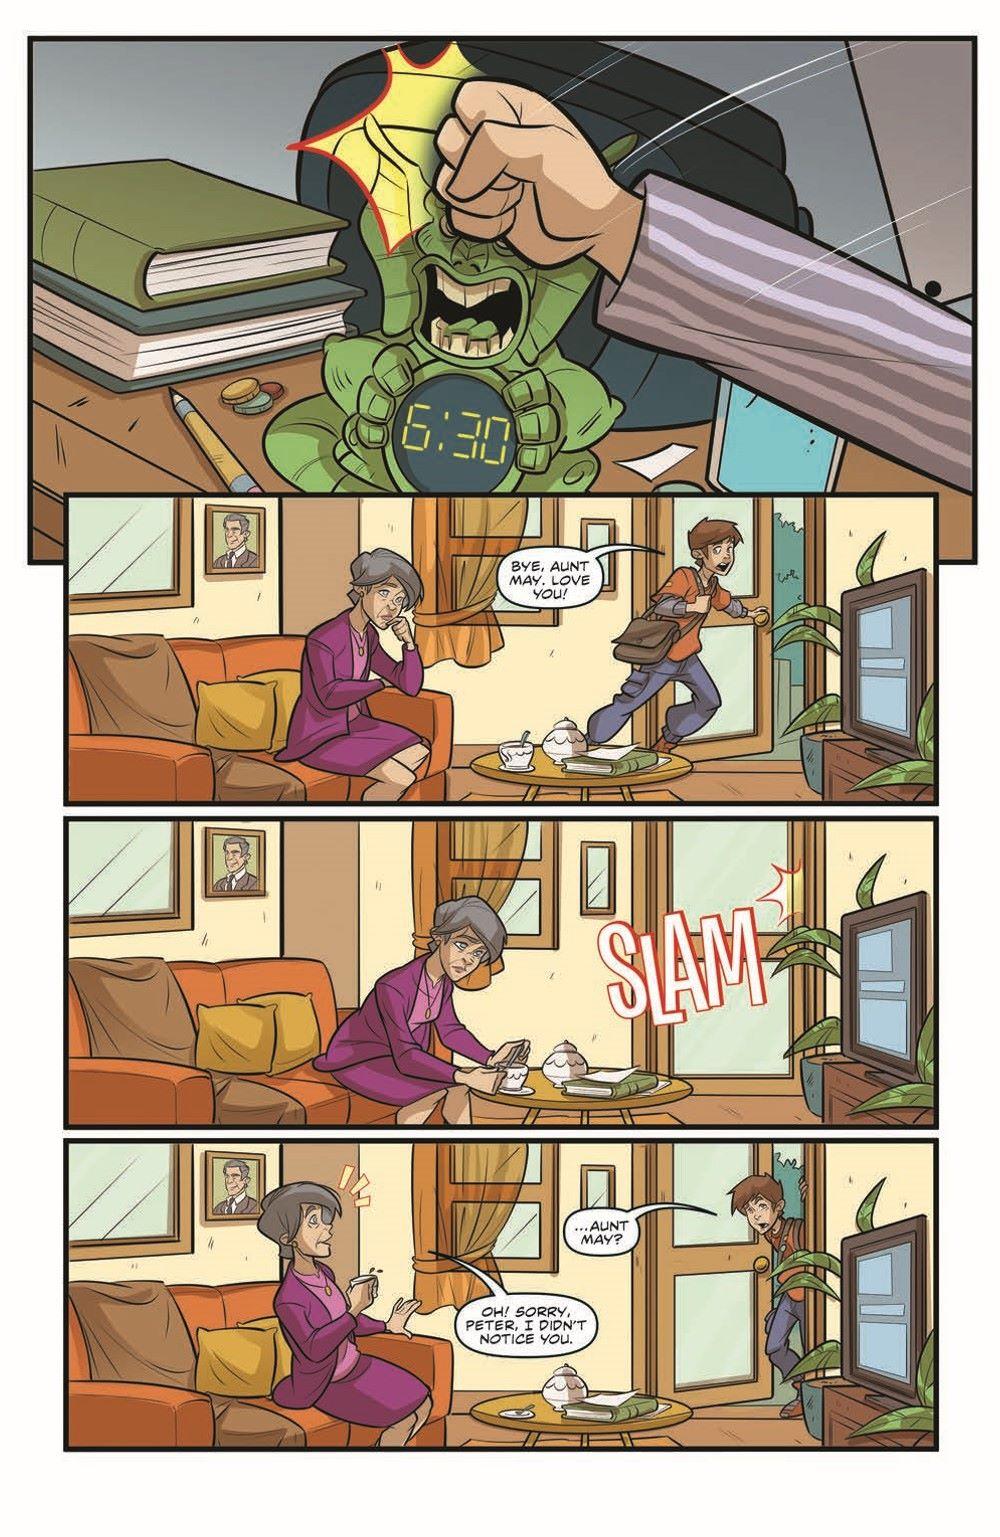 SpidermanV3-02_pr-3 ComicList Previews: MARVEL ACTION SPIDER-MAN VOLUME 3 #2